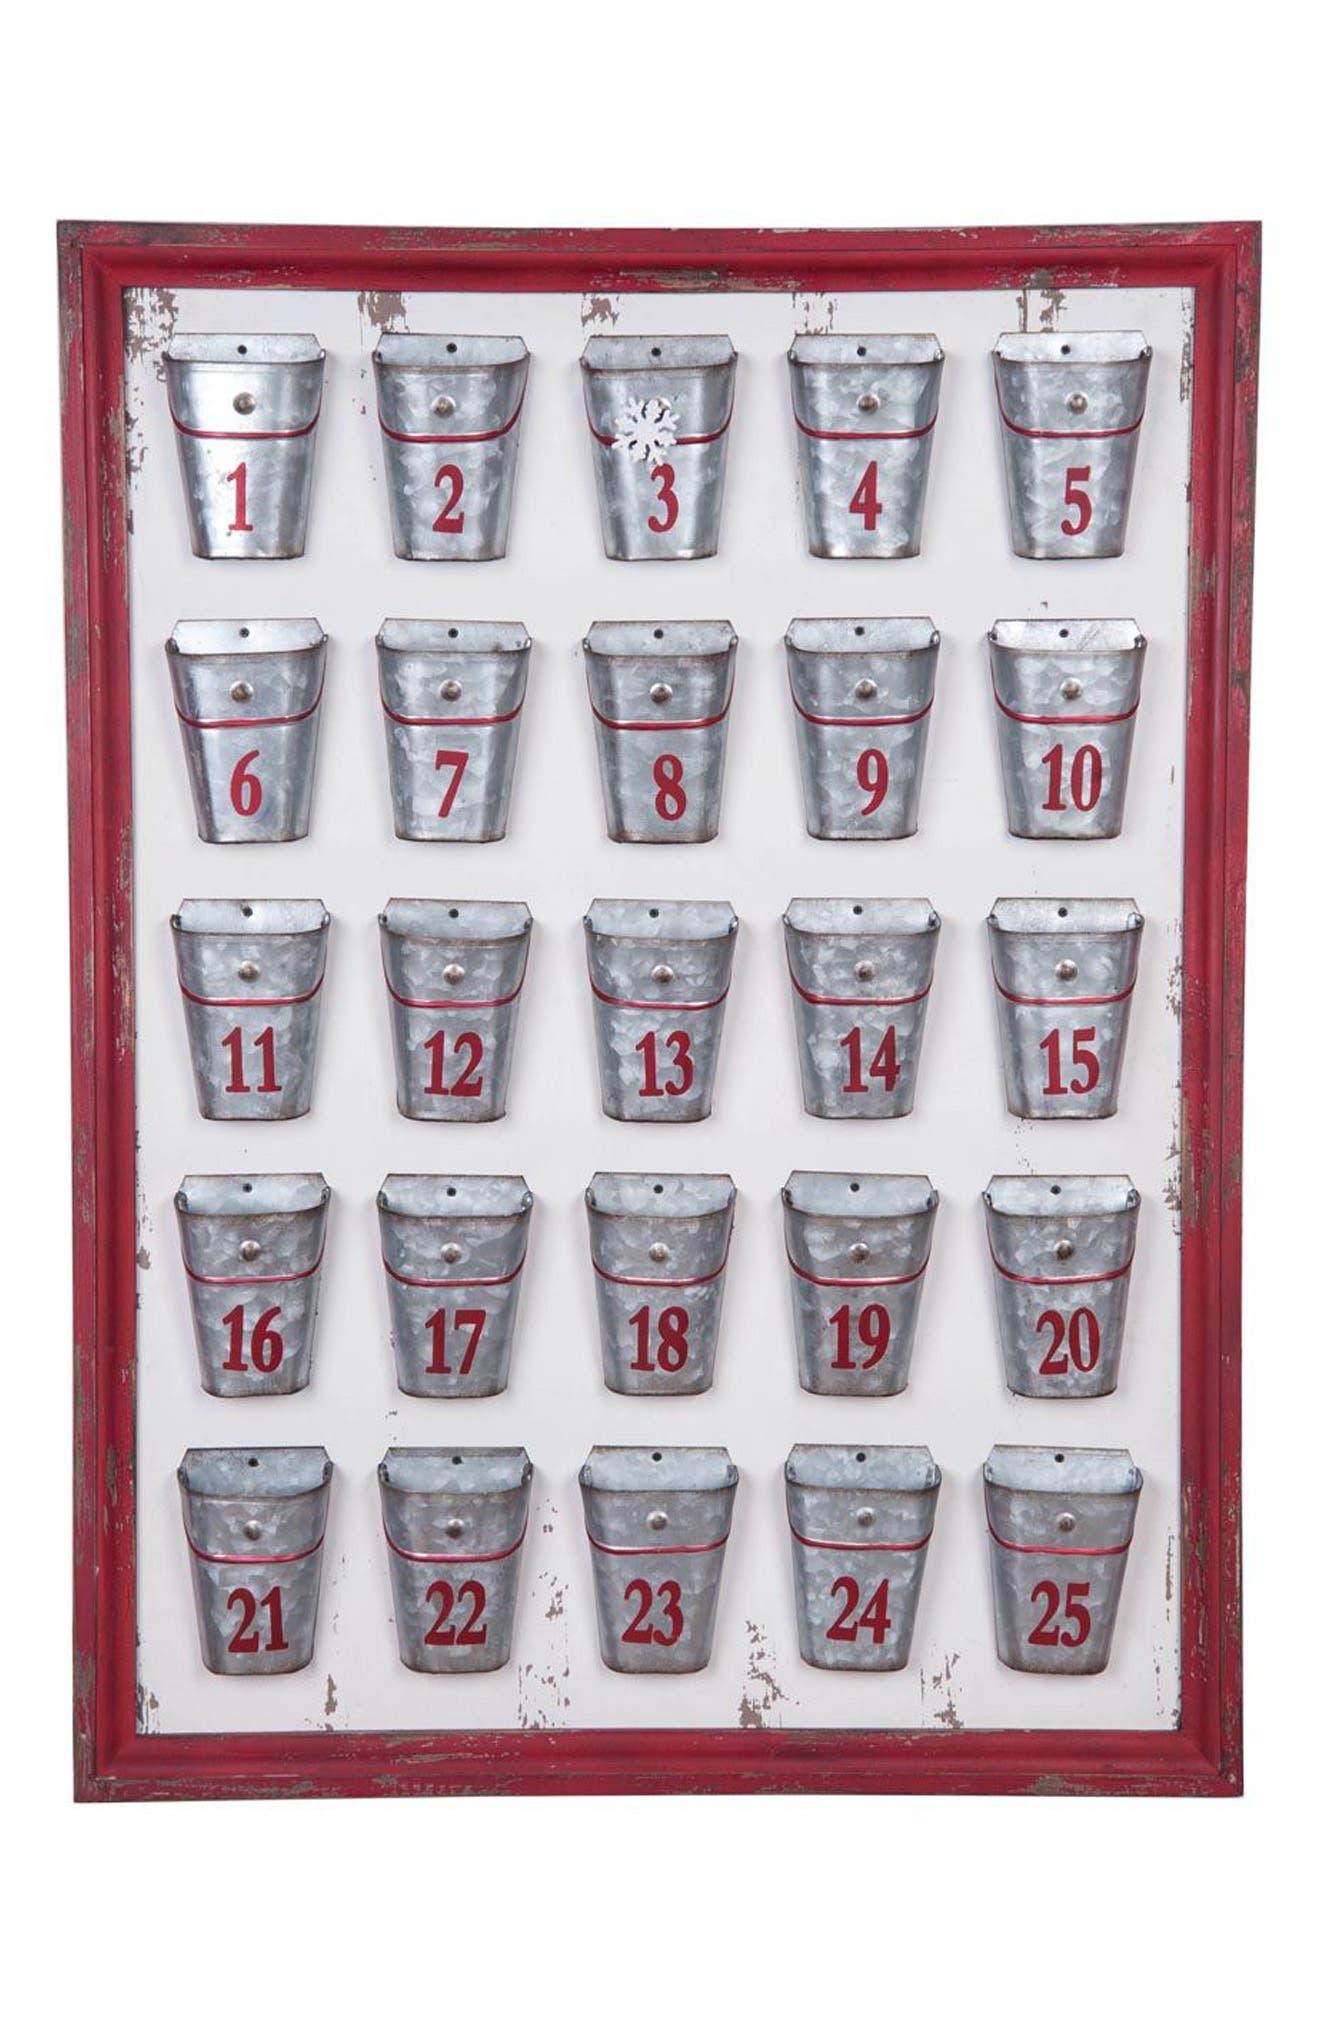 Main Image - Foreside Galvanized Bucket Advent Calendar